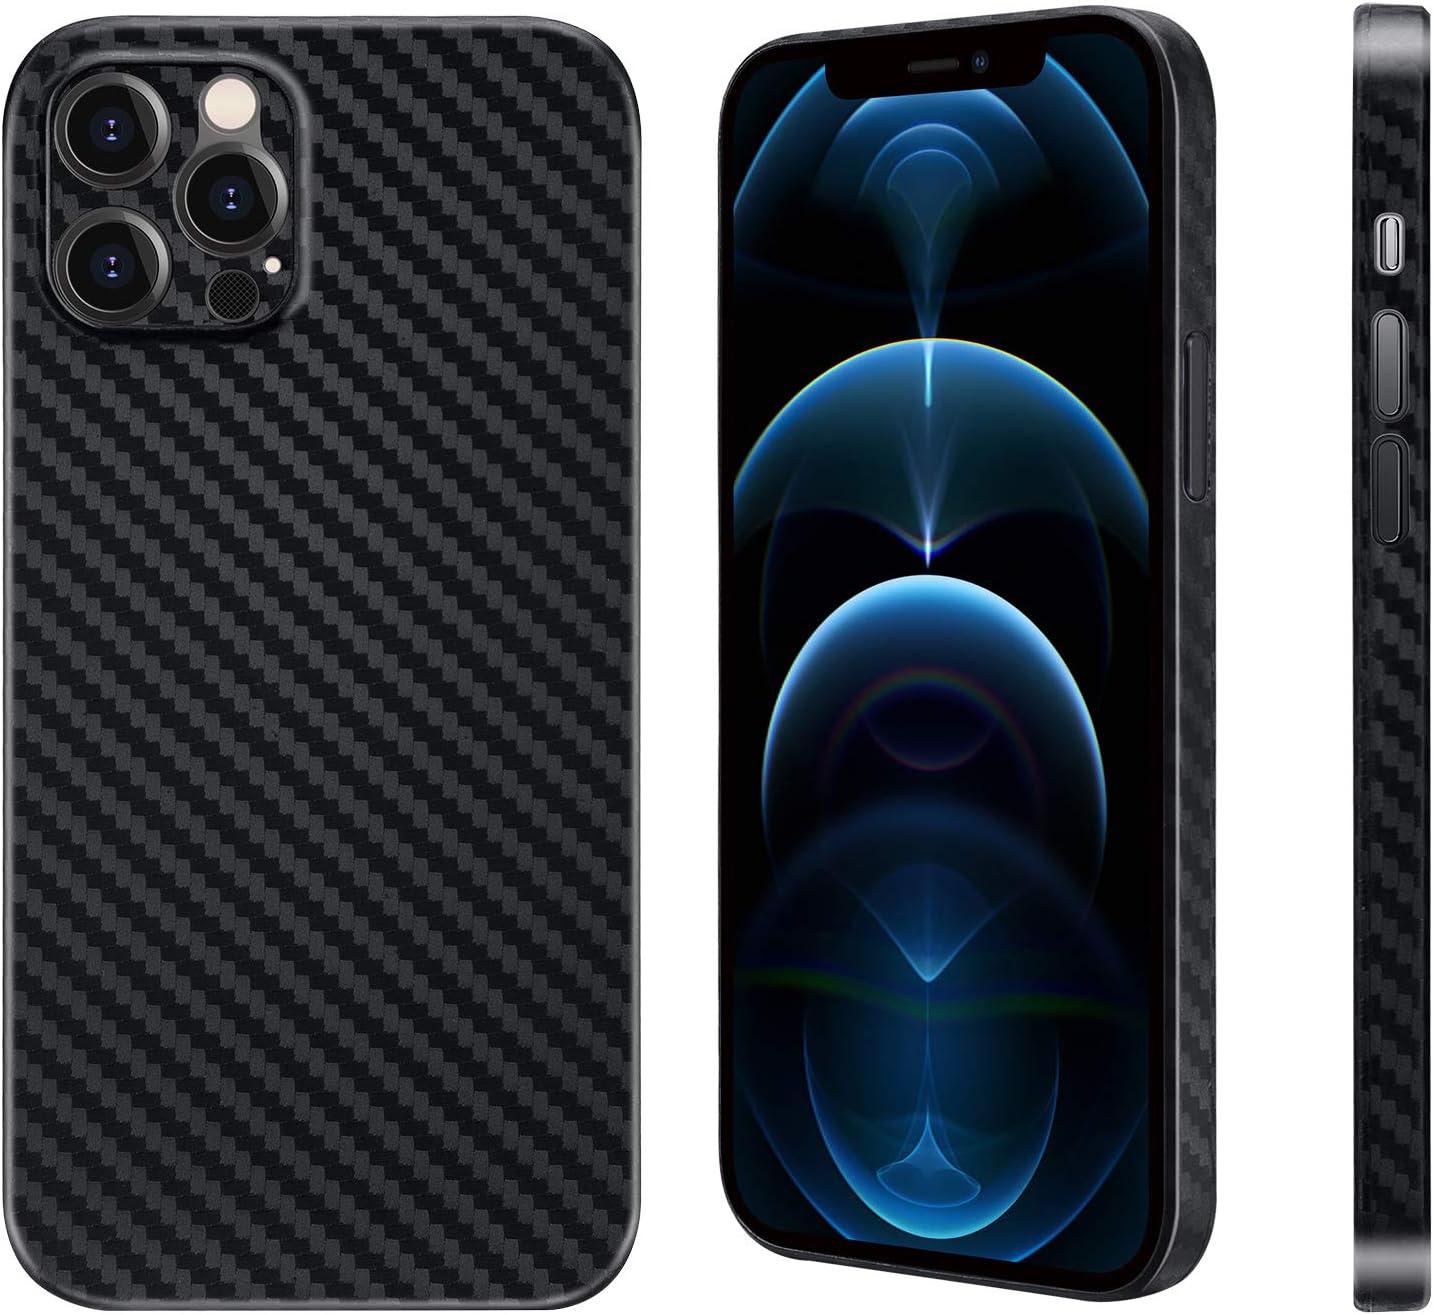 Carbon Fiber Texture Phone Case for iPhone 12 Pro 6.1